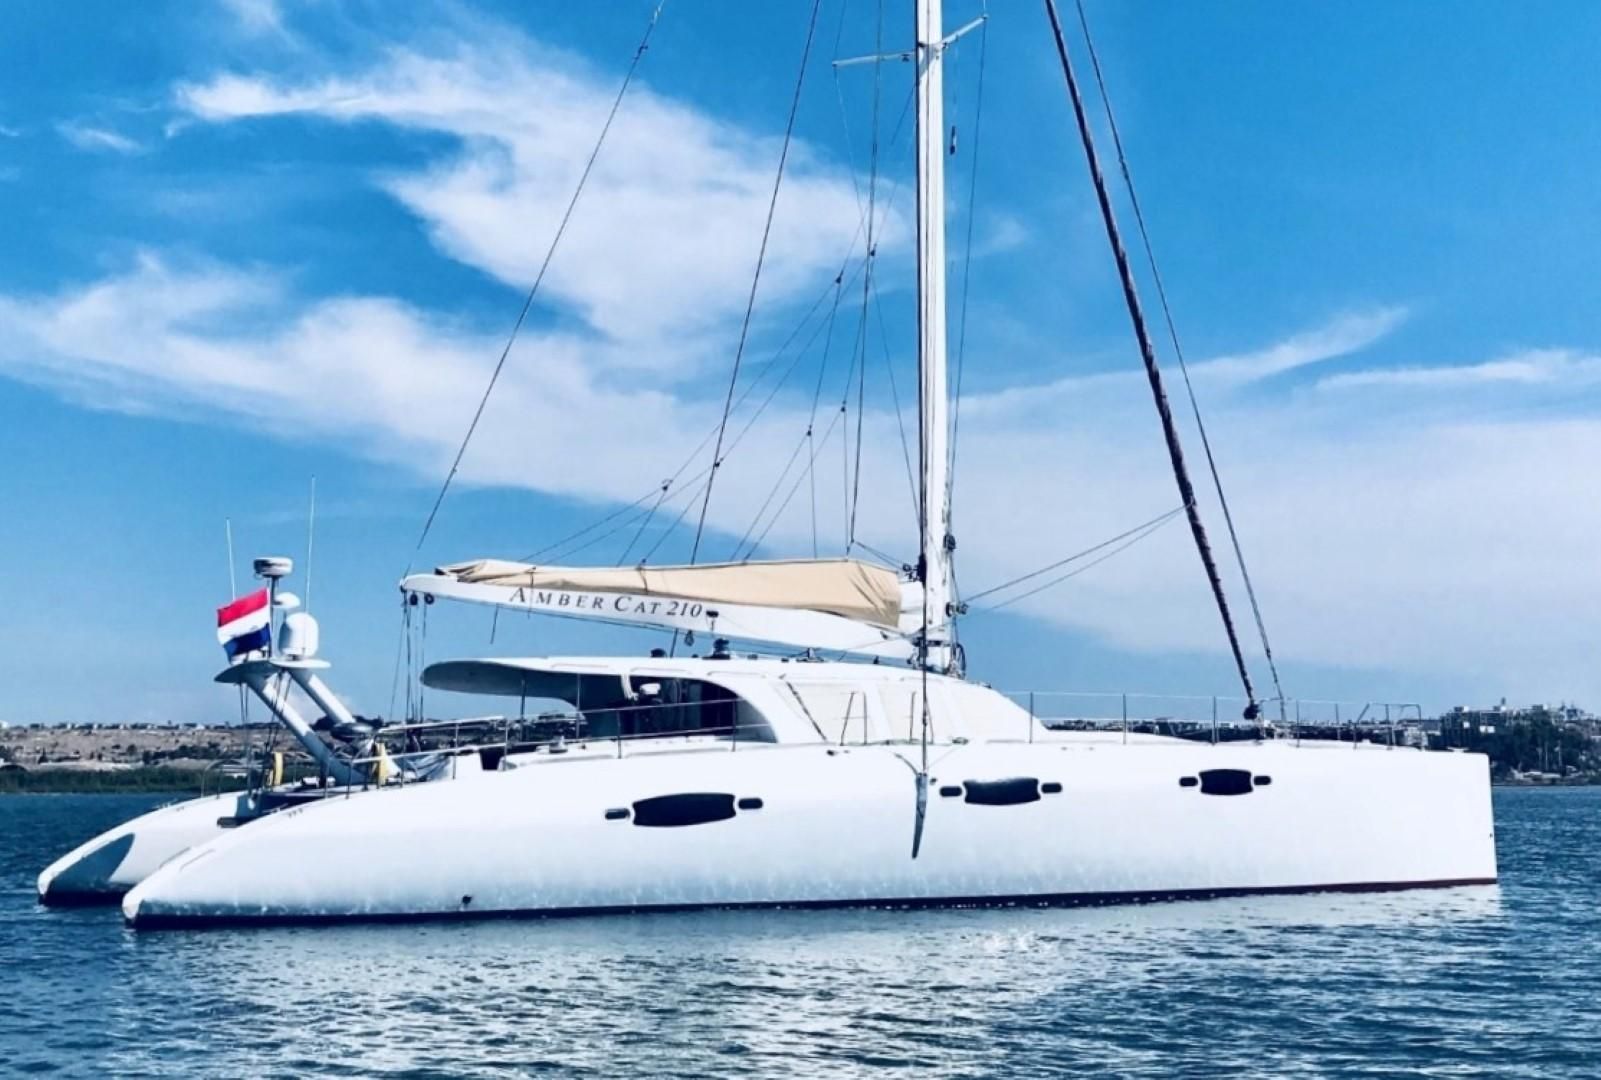 hight resolution of 2009 catamaran enmar ambercat 210